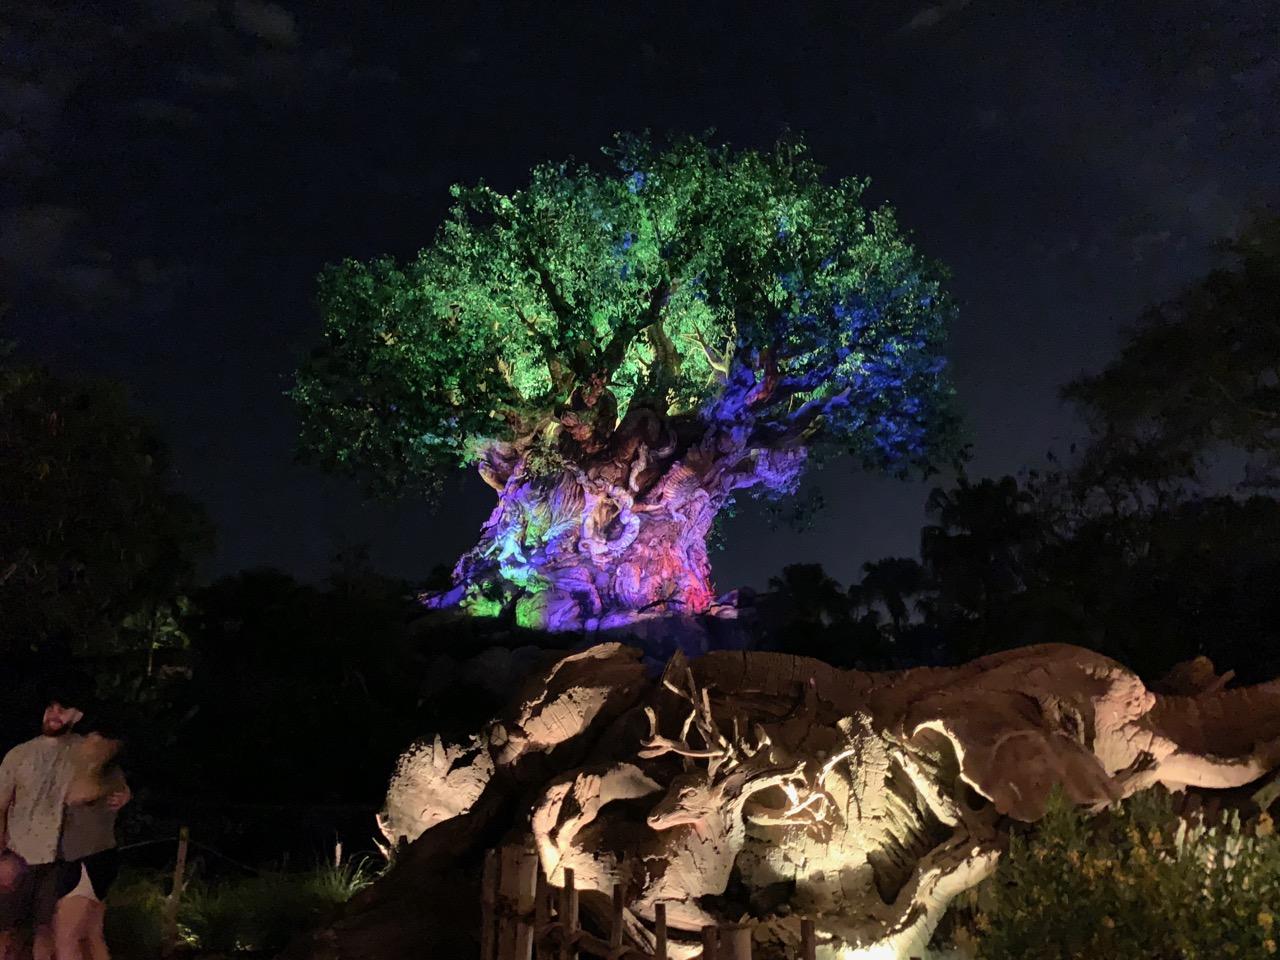 disney world animal kingdom after hours 40 tree of life.jpeg